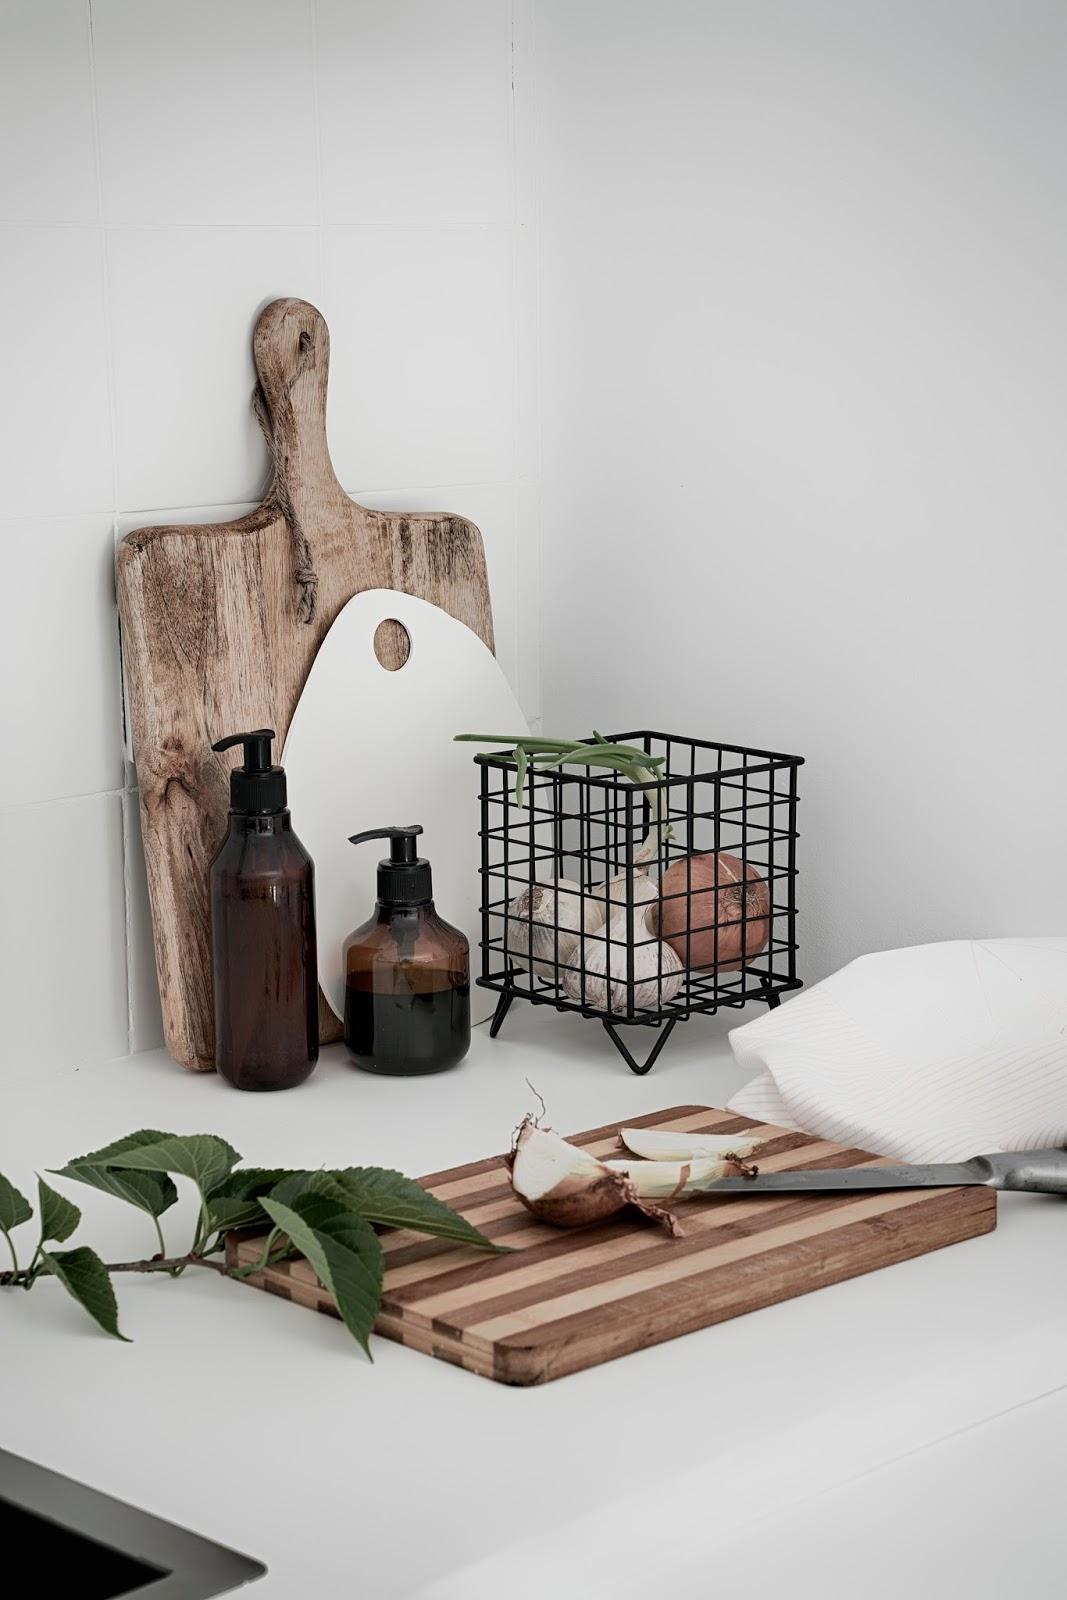 kitchen, cocina, tabla de cortar, cutting table, soap, decoration, nordic, interior, scandinavian,